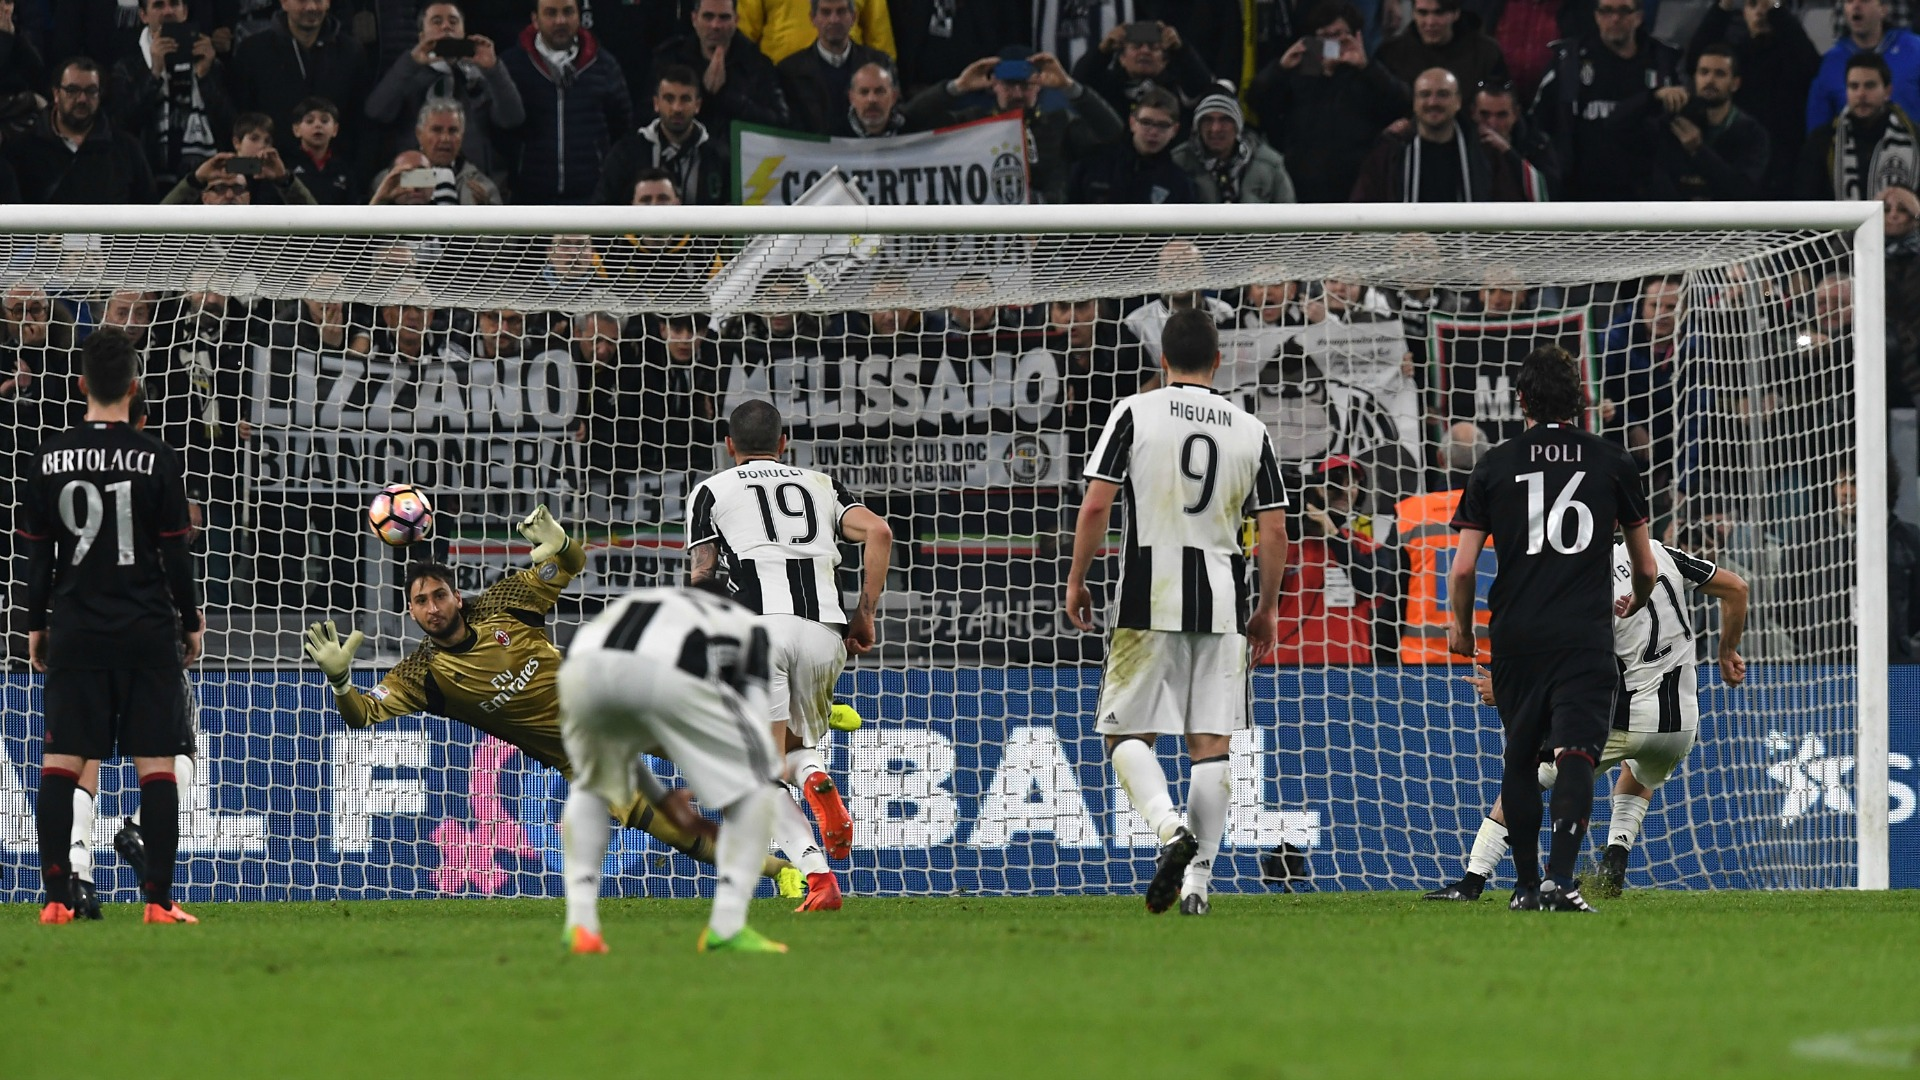 Paulo Dybala Gianluigi Donnarumma Juventus Milan Serie A